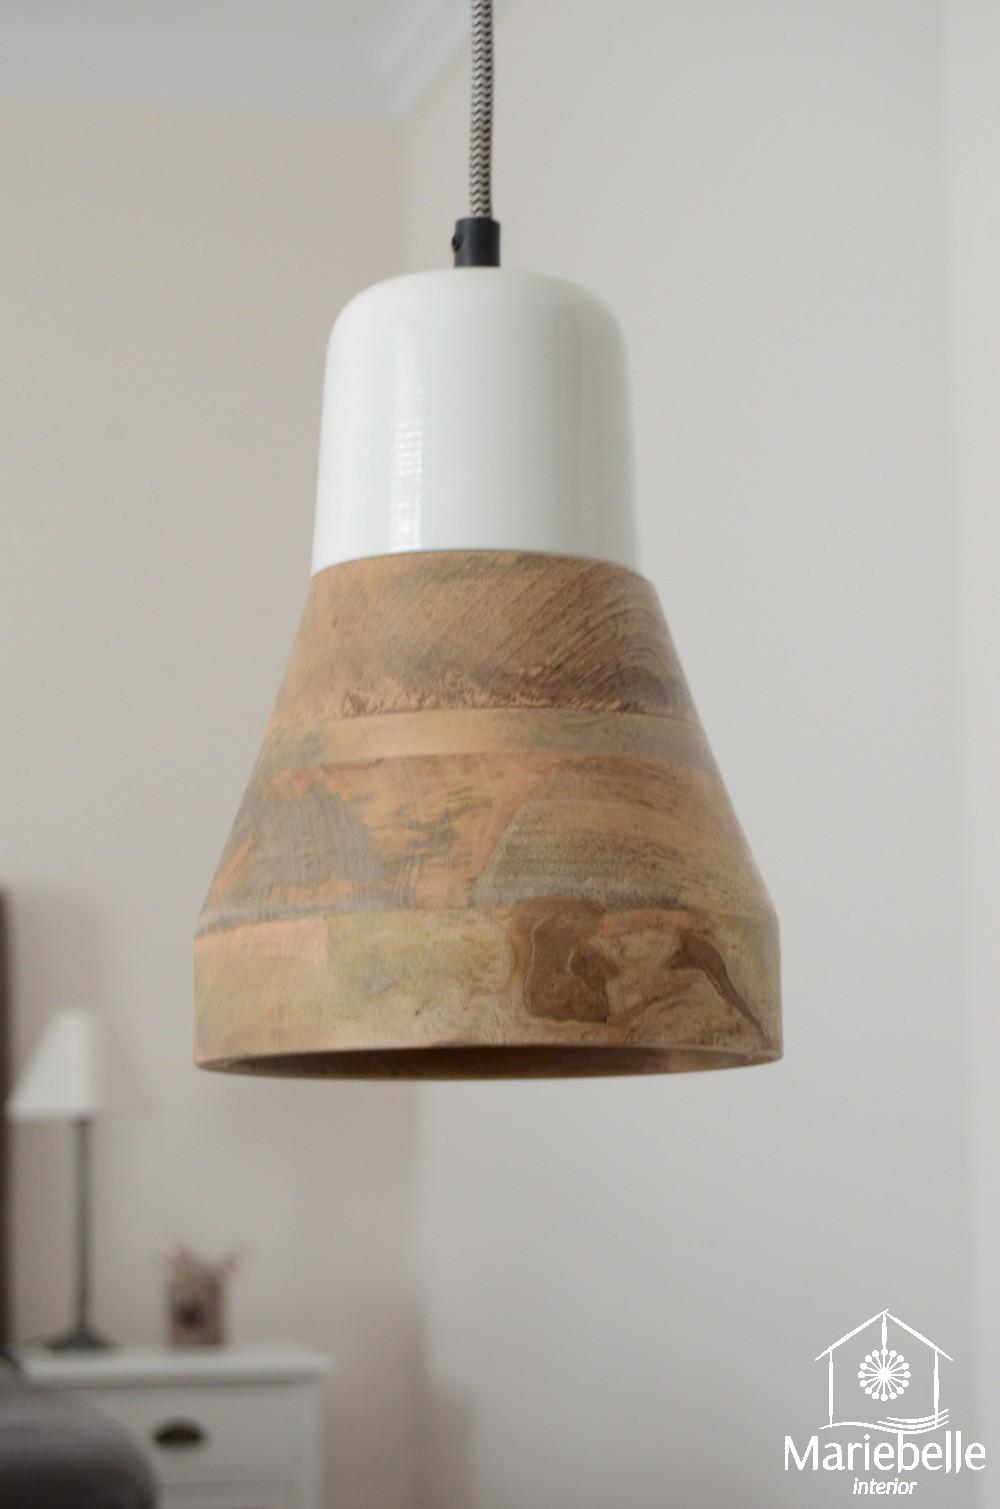 h ngelampe holz wei k chen leuchte landhaus pendel decken. Black Bedroom Furniture Sets. Home Design Ideas